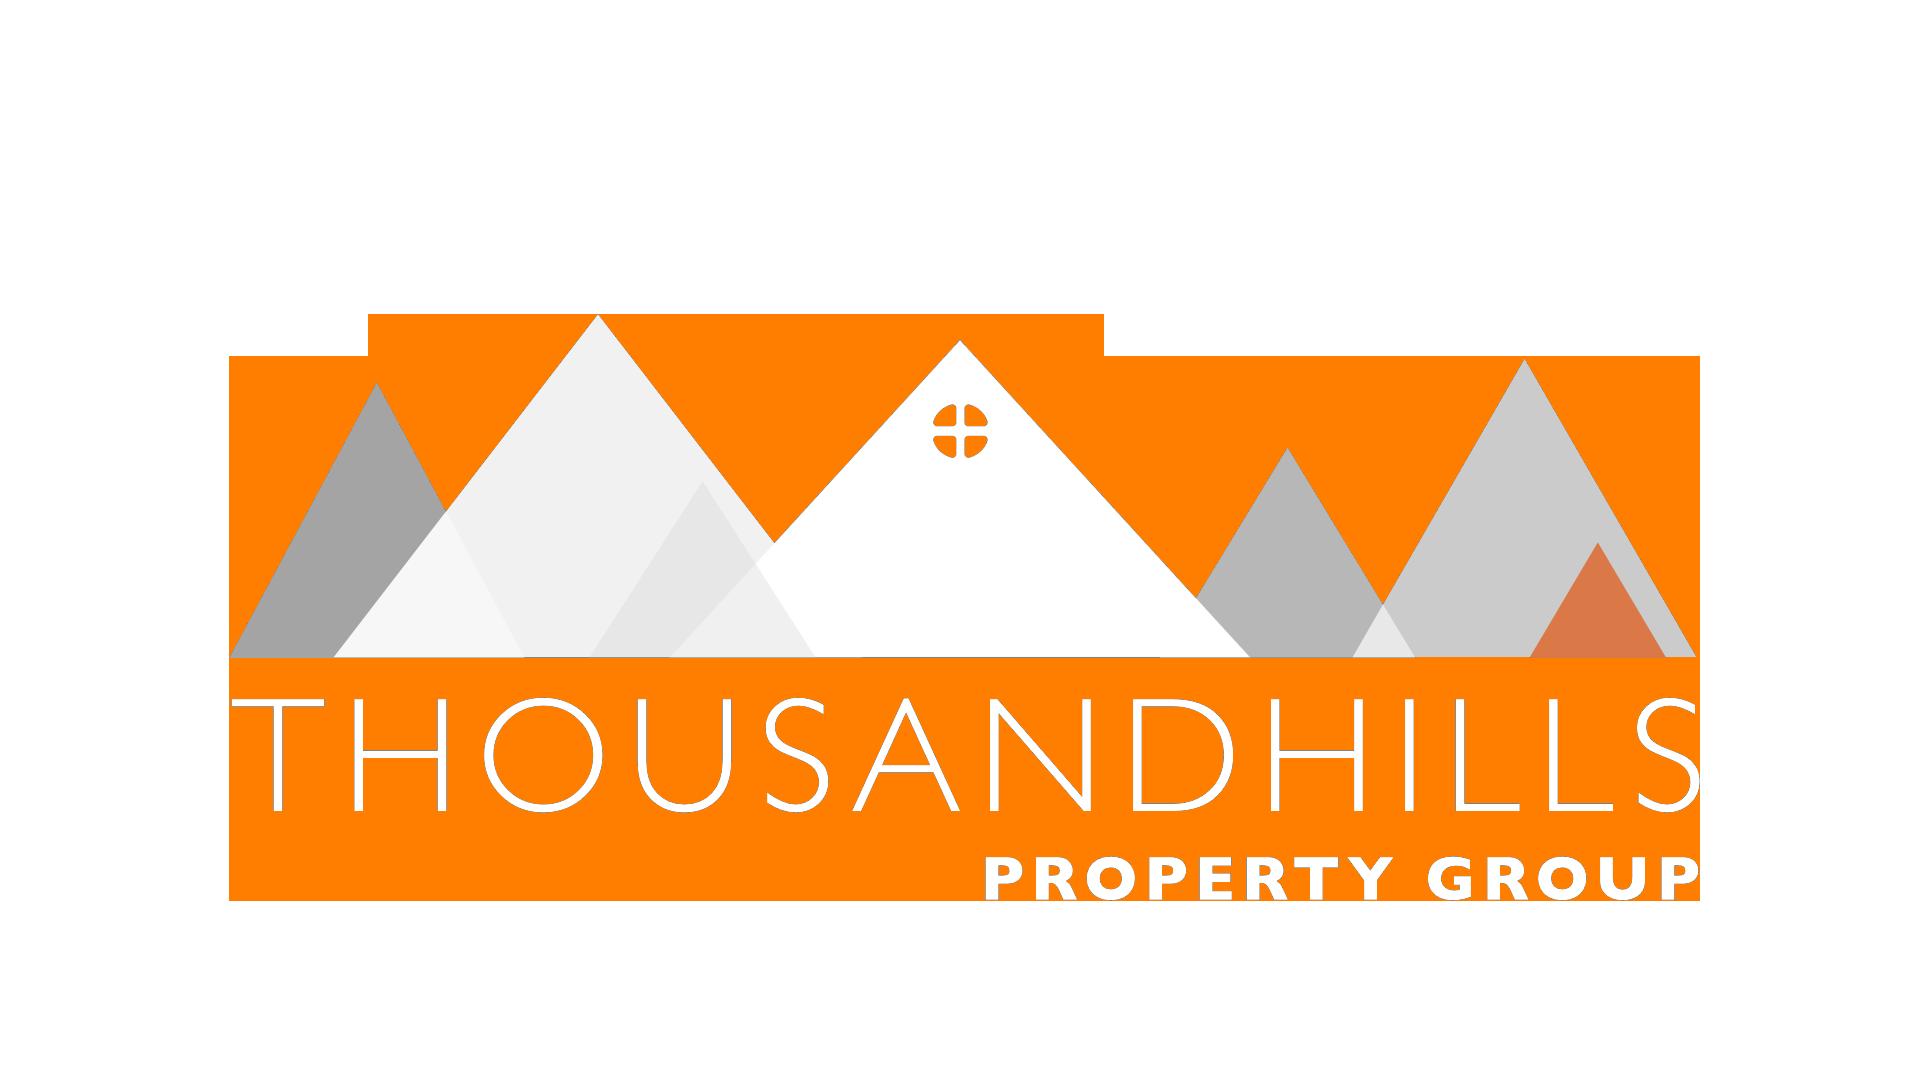 1000hills logo6.003.png